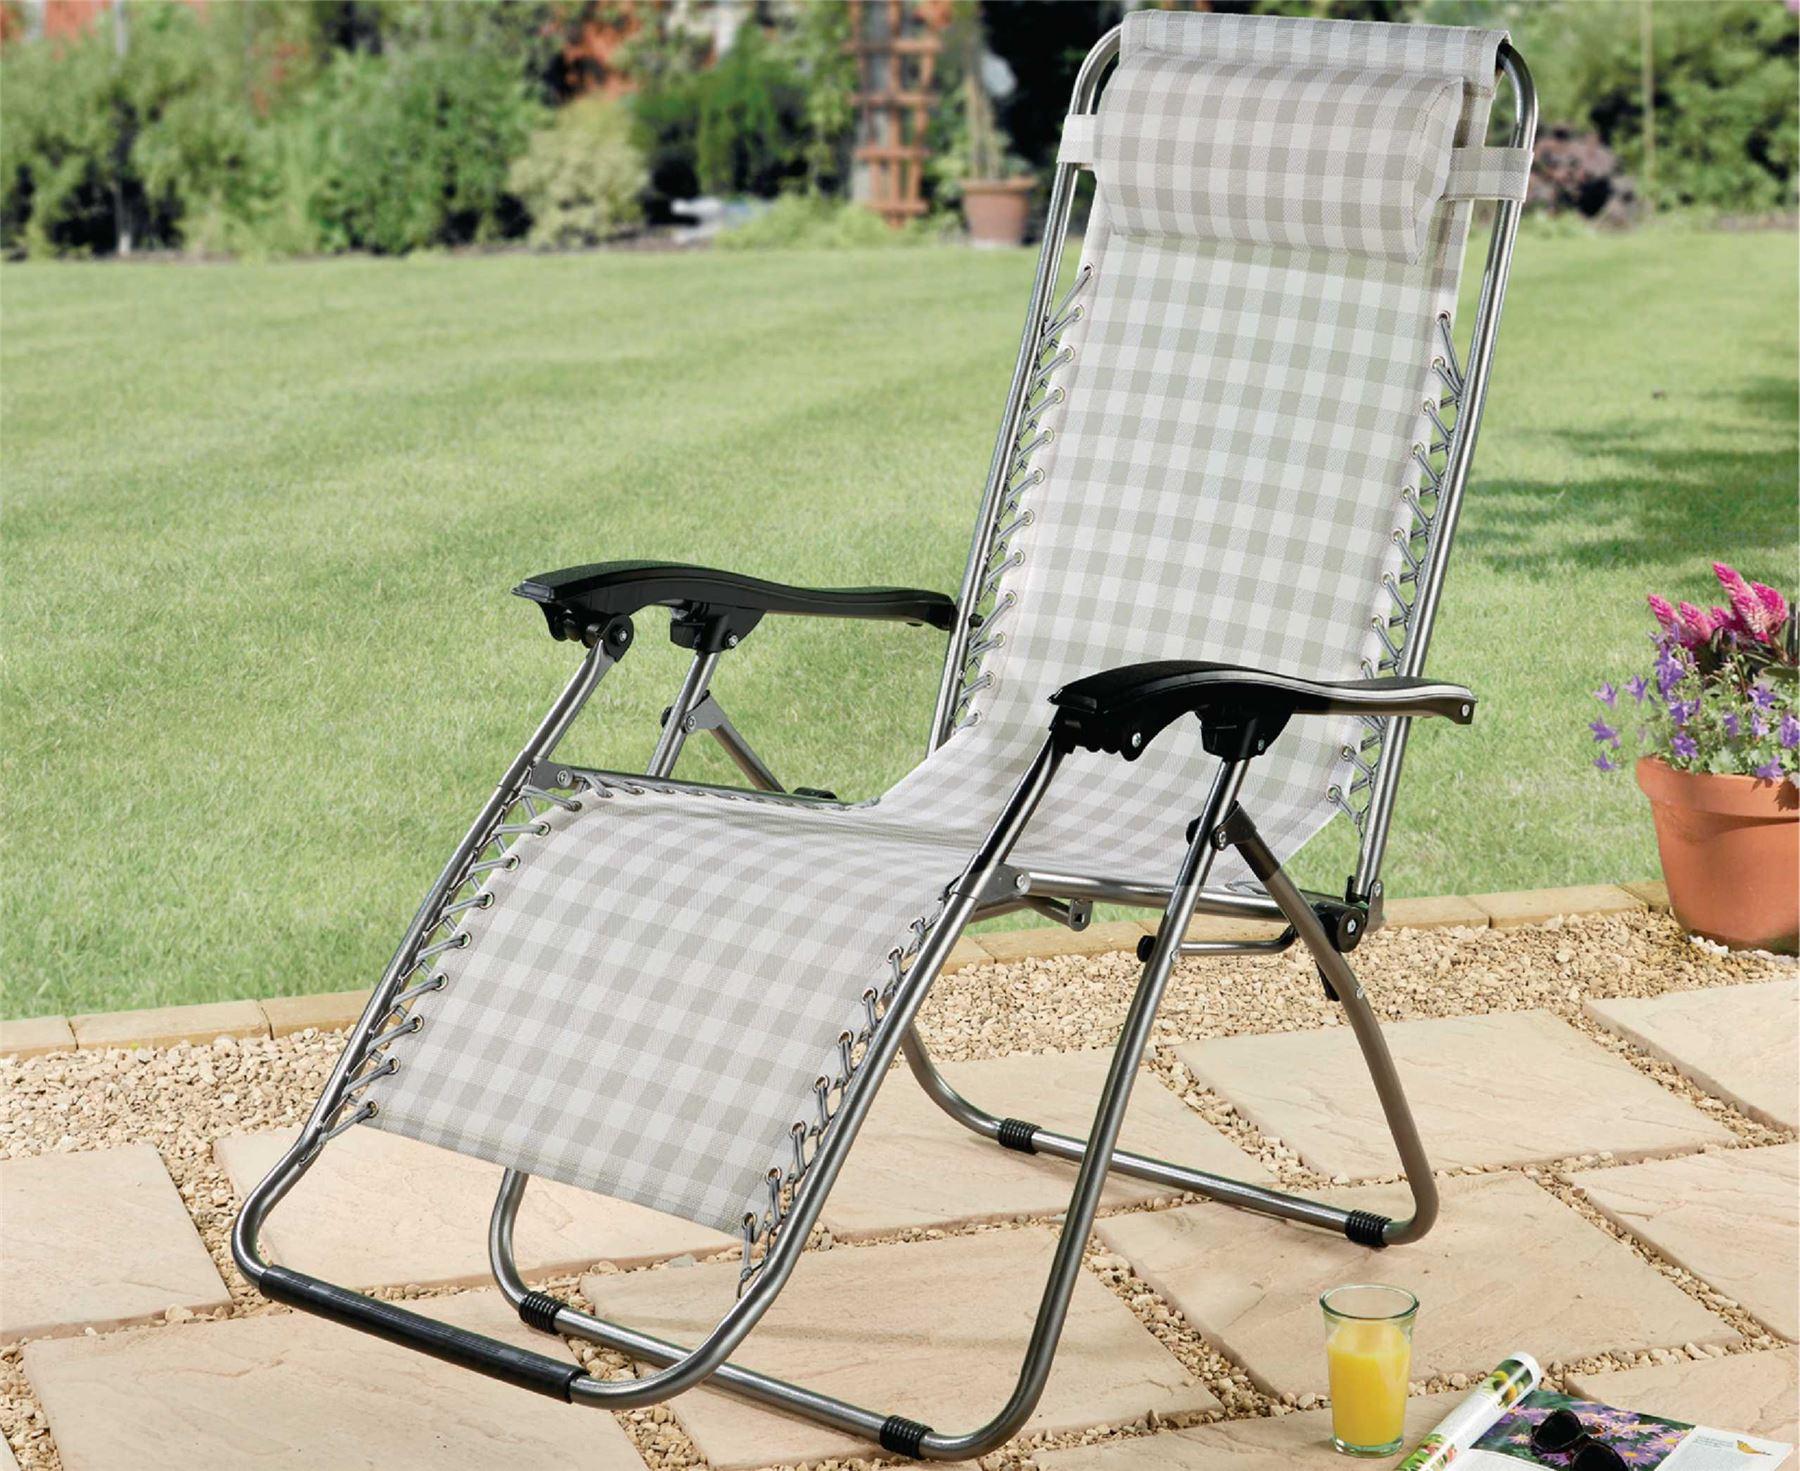 Easy-Riser-Recliner-Chair-Stool-Armchair-Outdoor-Garden- & Easy Riser Recliner Chair Stool Armchair Outdoor Garden Adjustable ... islam-shia.org